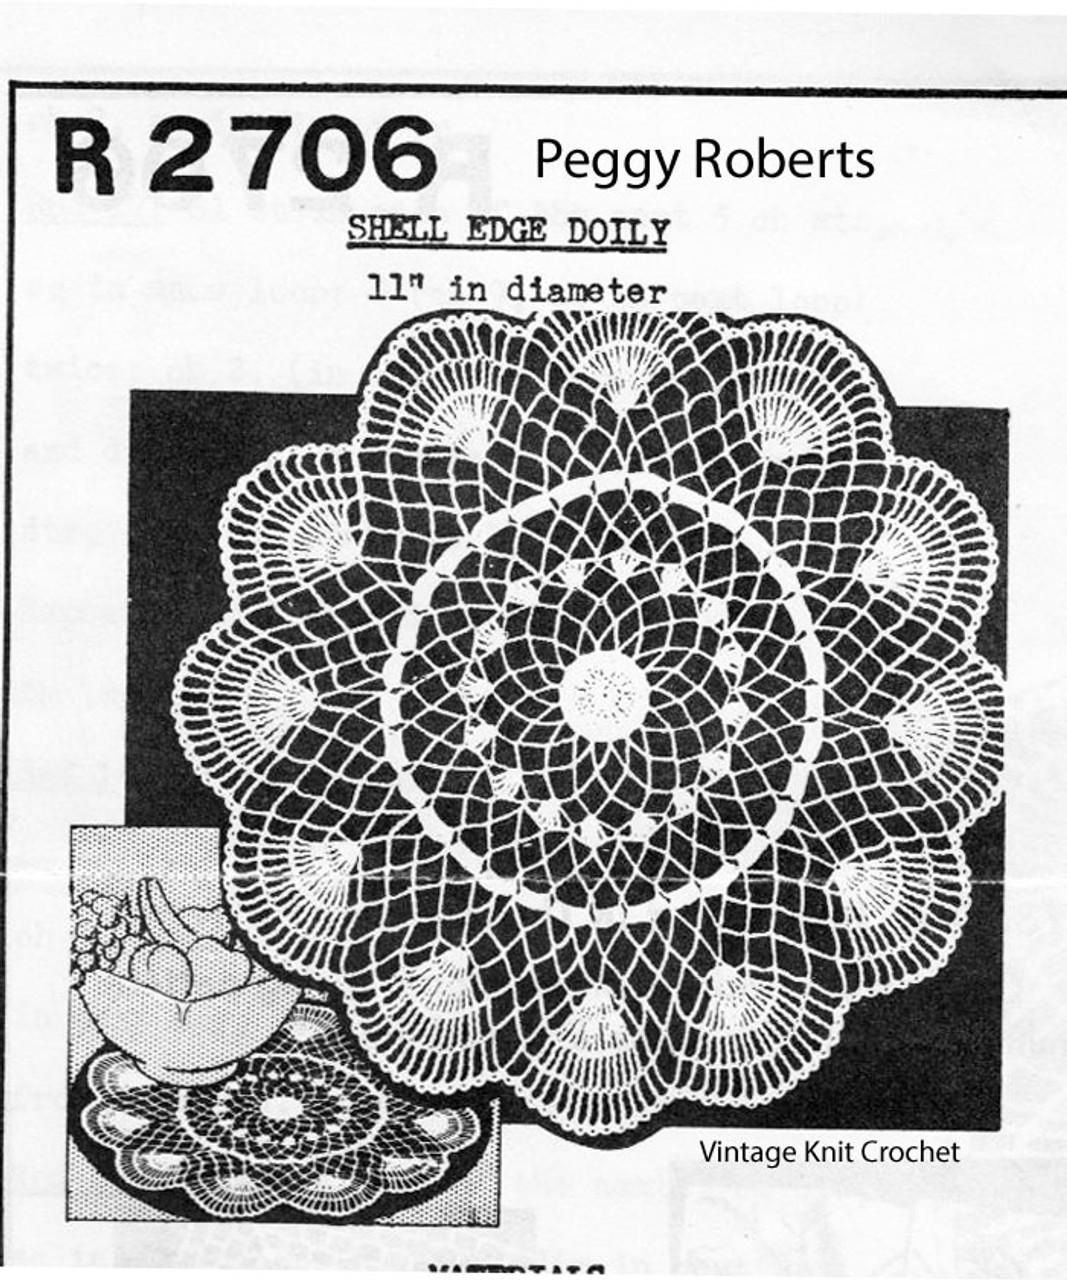 Crochet Shell Border Doily pattern R-2706